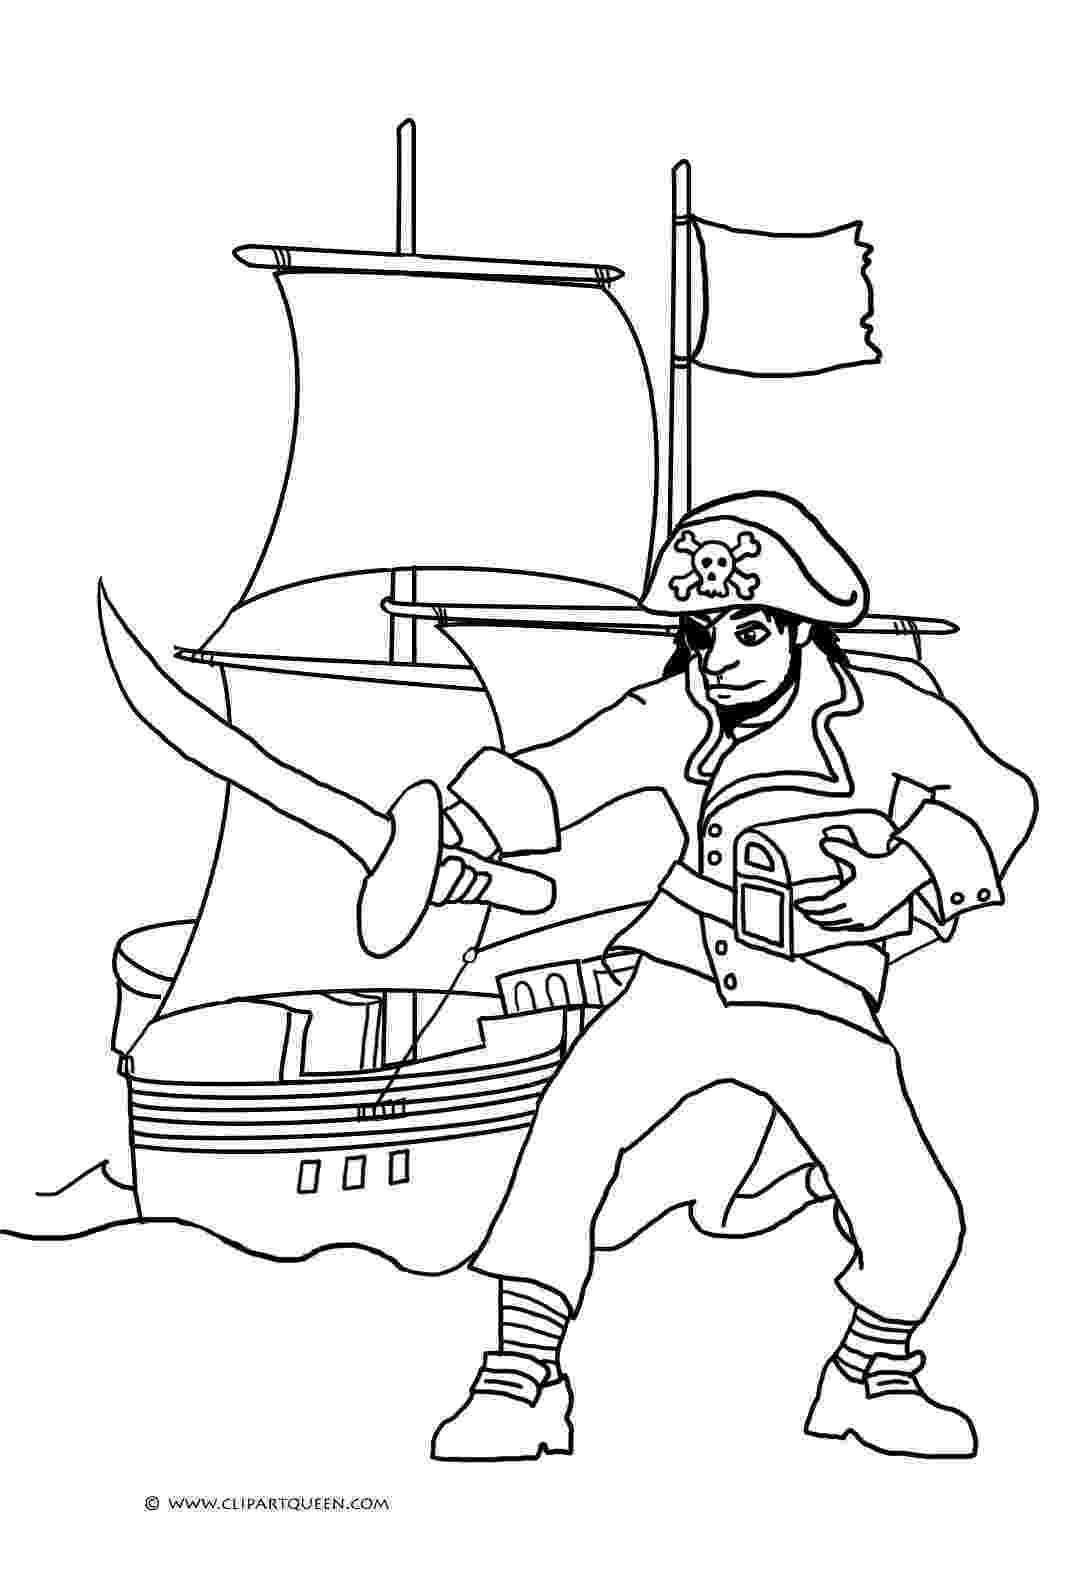 pirates coloring pages pirate coloring pages pirates coloring pages